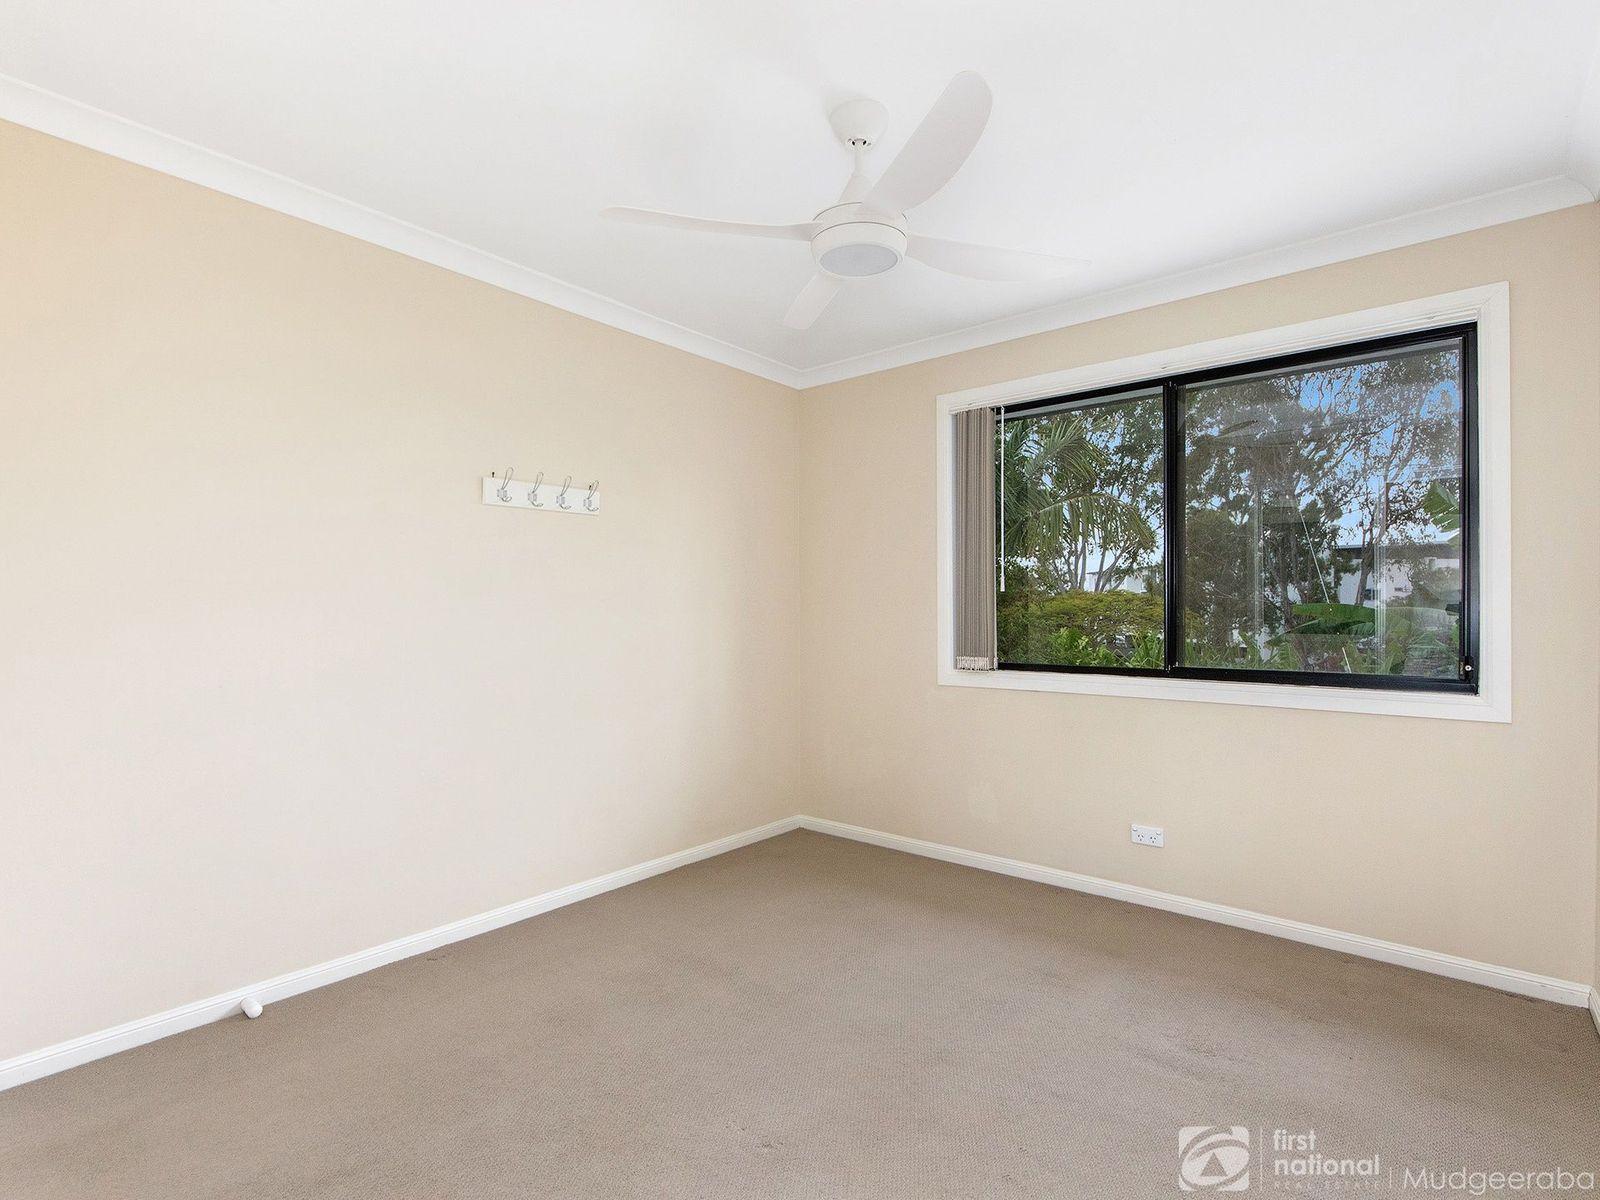 14/23 Bourton Rd, Merrimac, QLD 4226